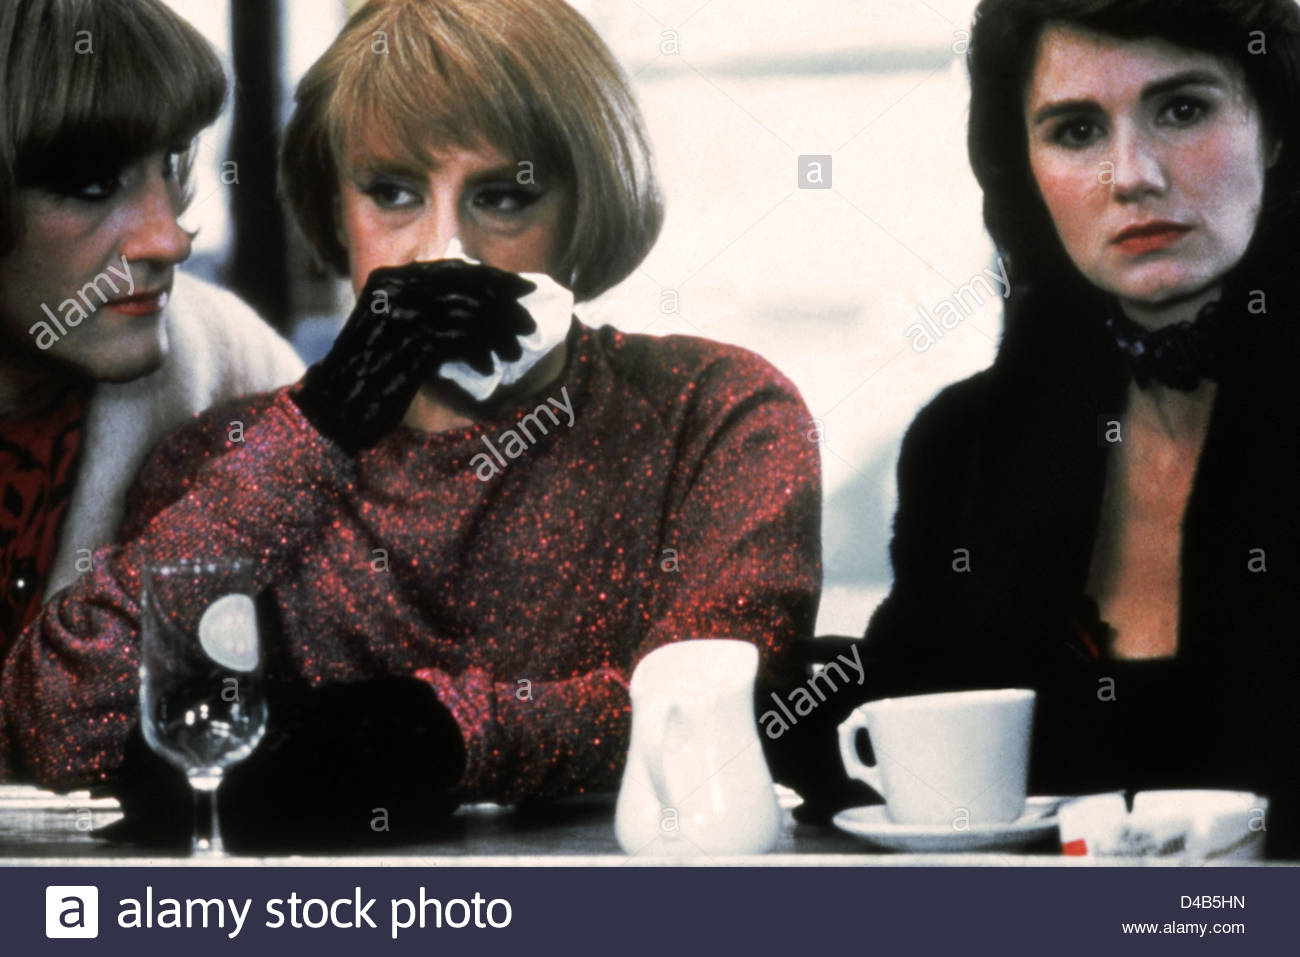 TENUE DE SOIRÉE (1986) MENAGE (ALT) GERARD DEPARDIEU MICHEL BLANC MIOU MIOU BERTRAND BLIER (DIR) TDS 001 MOVIESTORE Stockbild